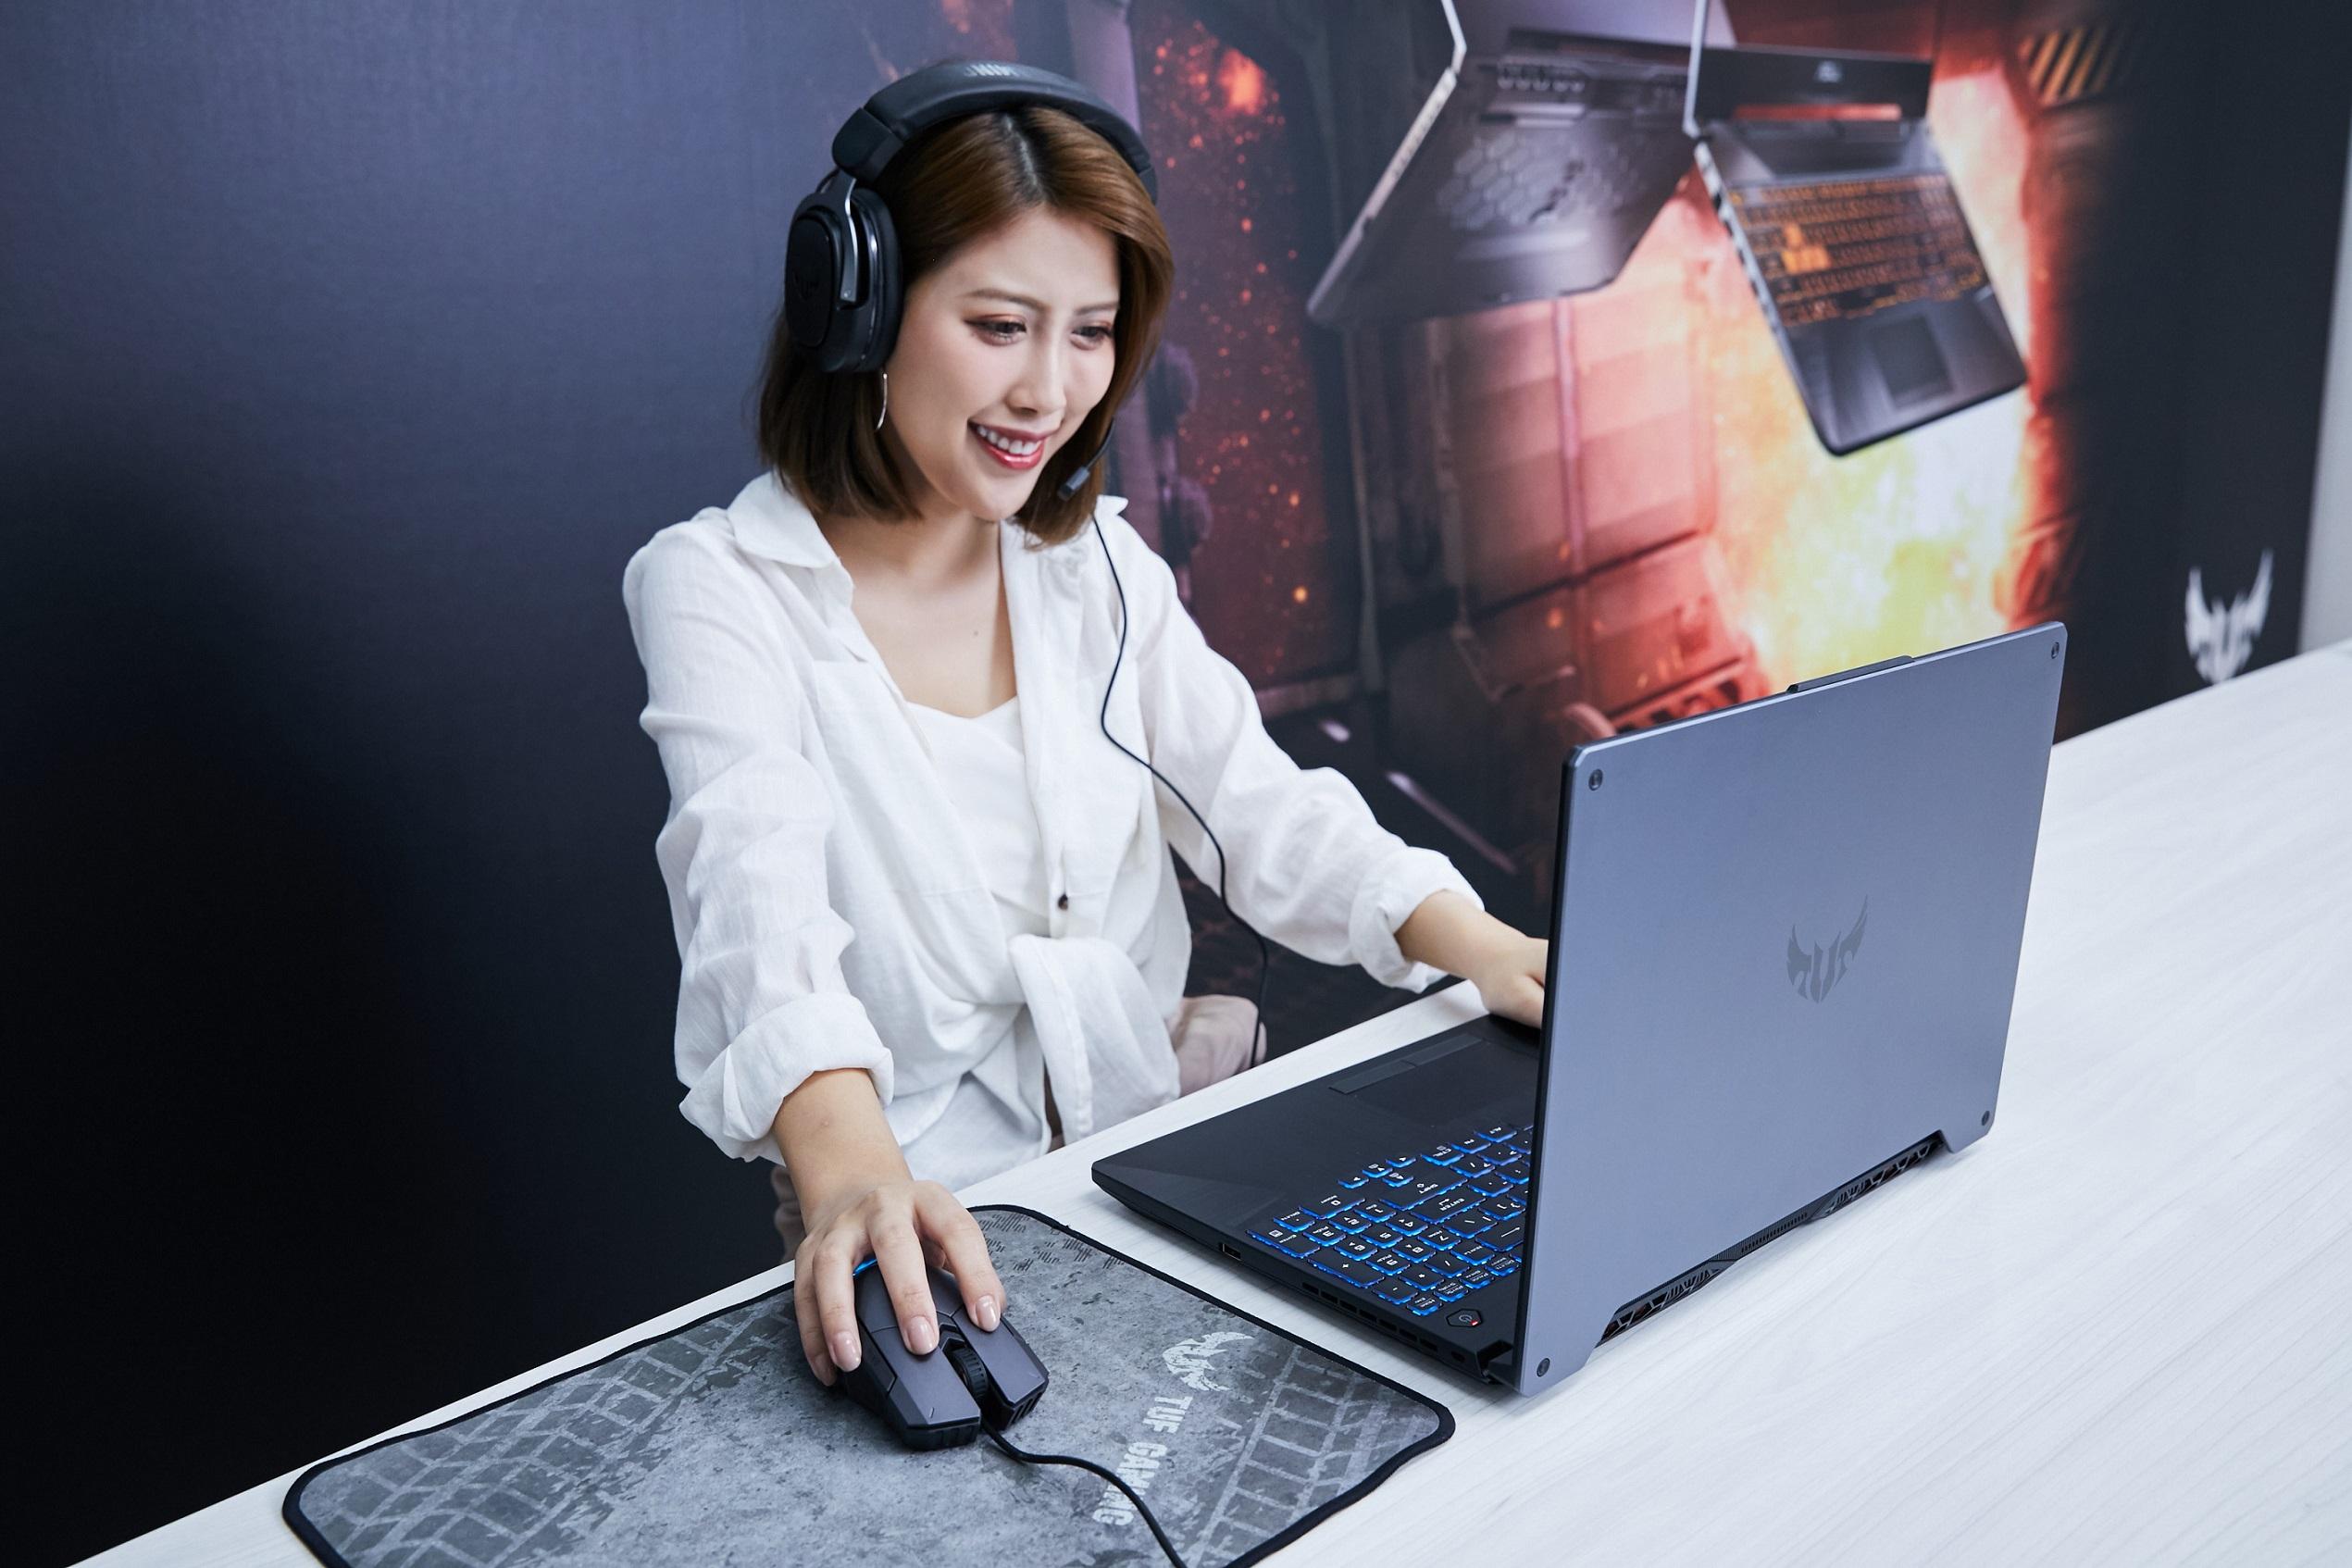 ASUS TUF Gaming A15/A17配備IPS級窄邊框螢幕與7.1聲道虛擬環繞音效的揚聲器,提供玩家劇院級的娛樂體驗。